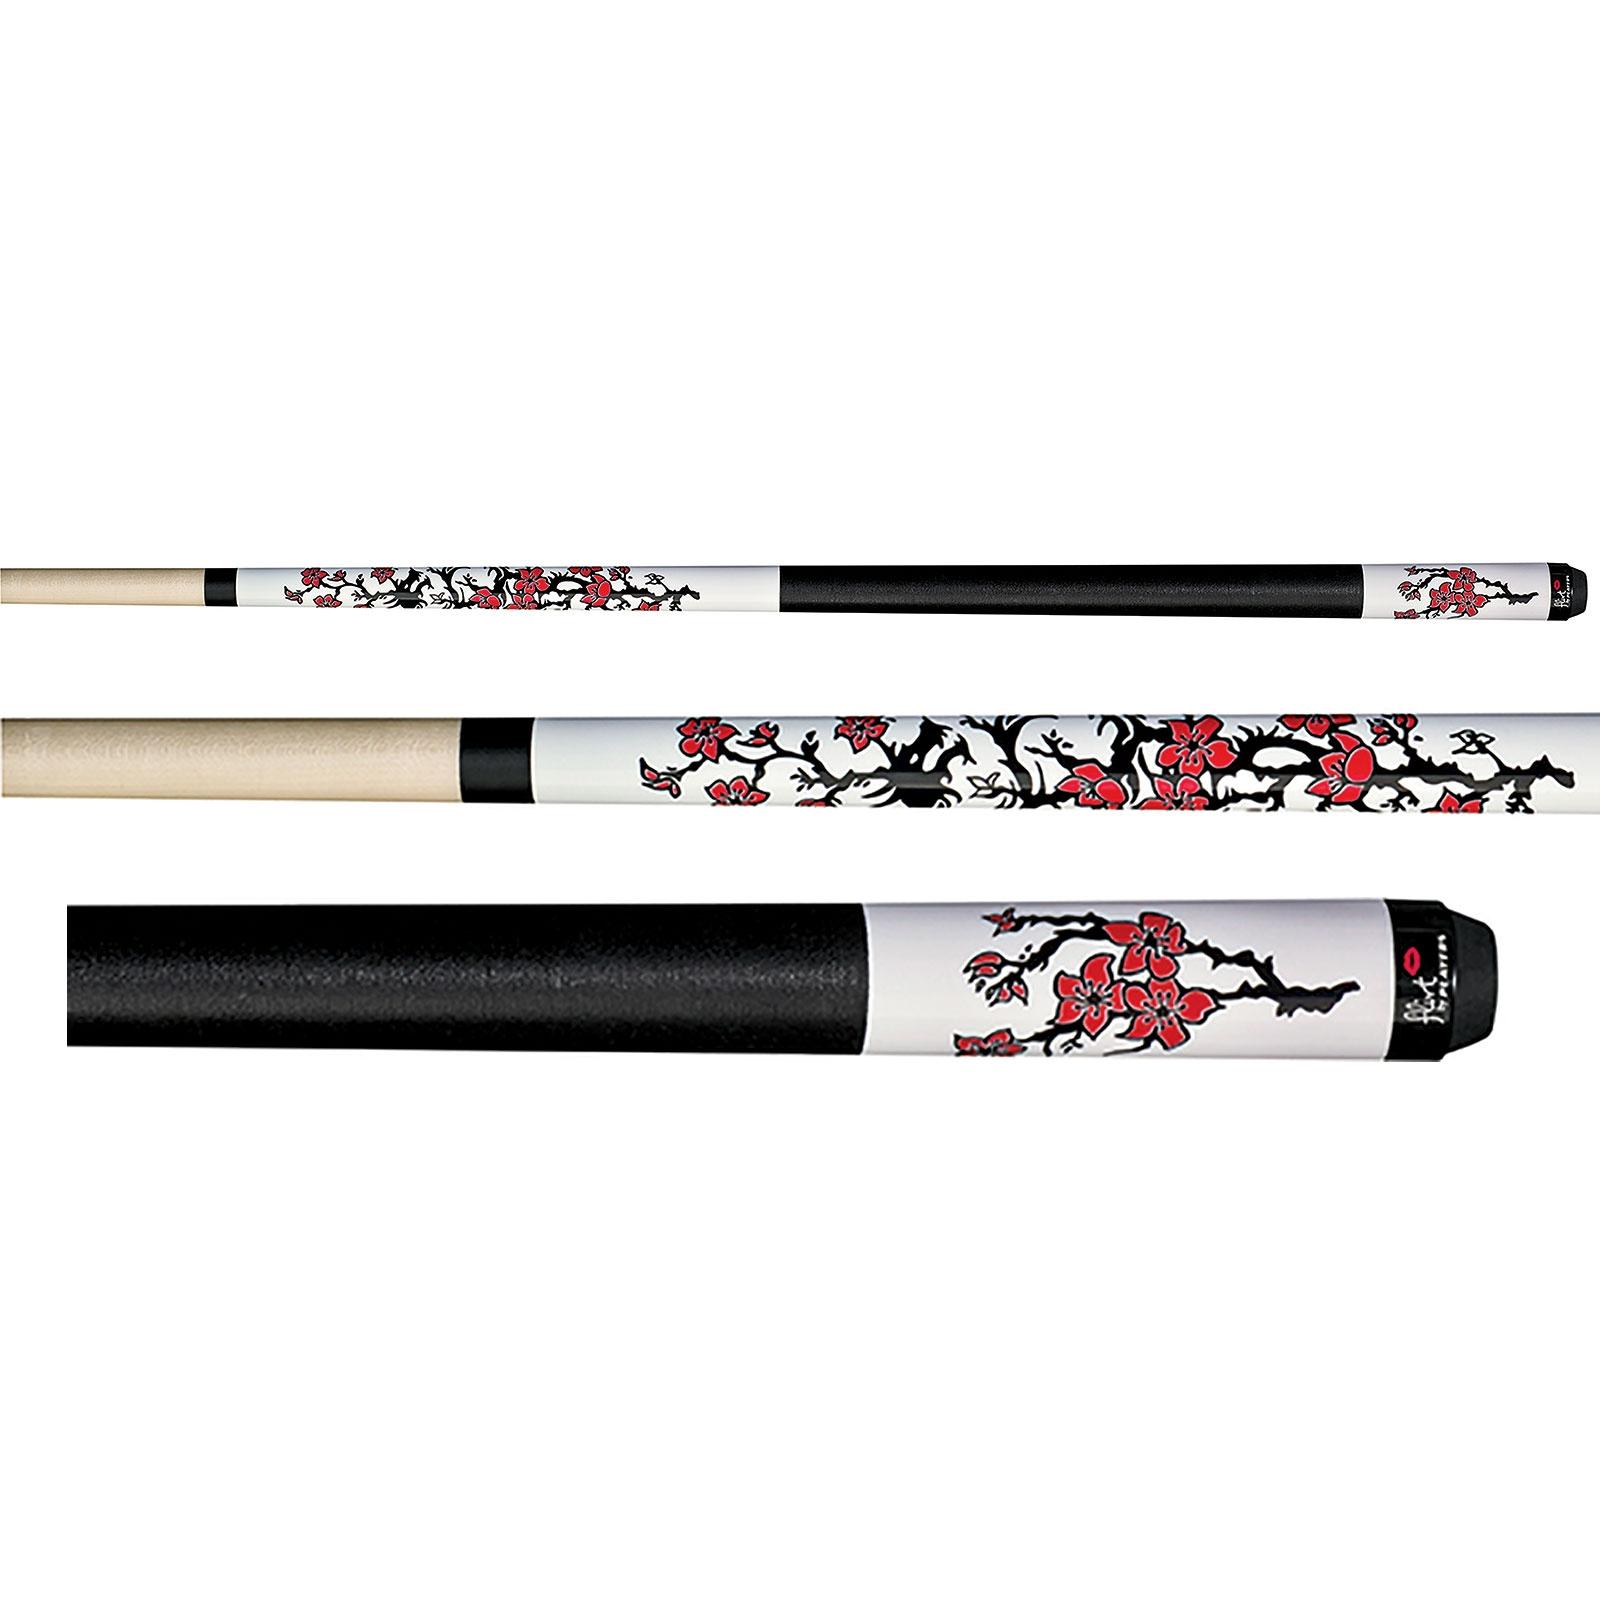 Players F 2630 Flirt Dragon Blossoms Pool Cue Stick